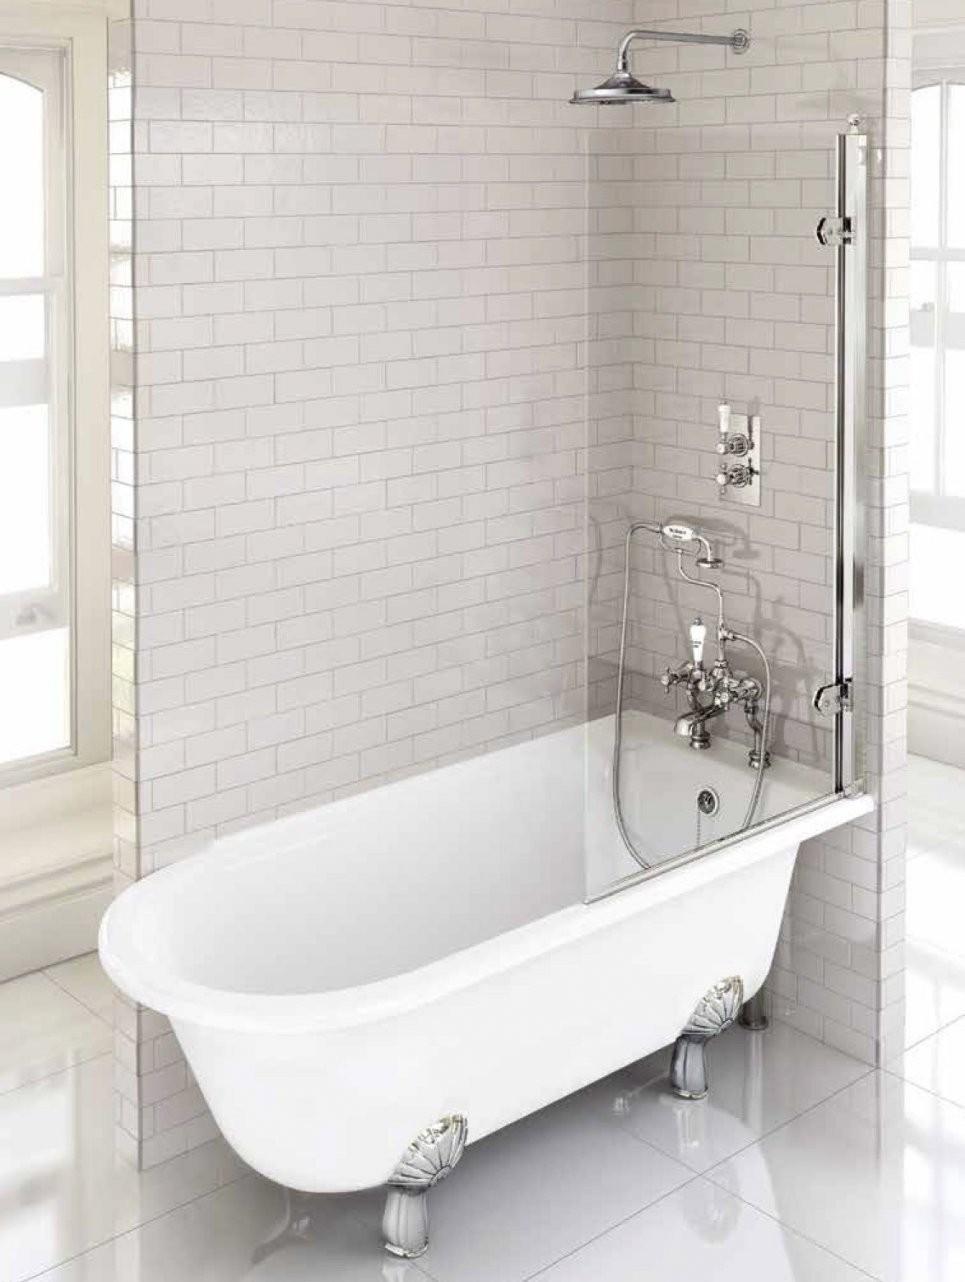 Badewanne Freistehend Antik  Retro Antik Messing Badewanne Dusche von Badewanne Freistehend Antik Bild